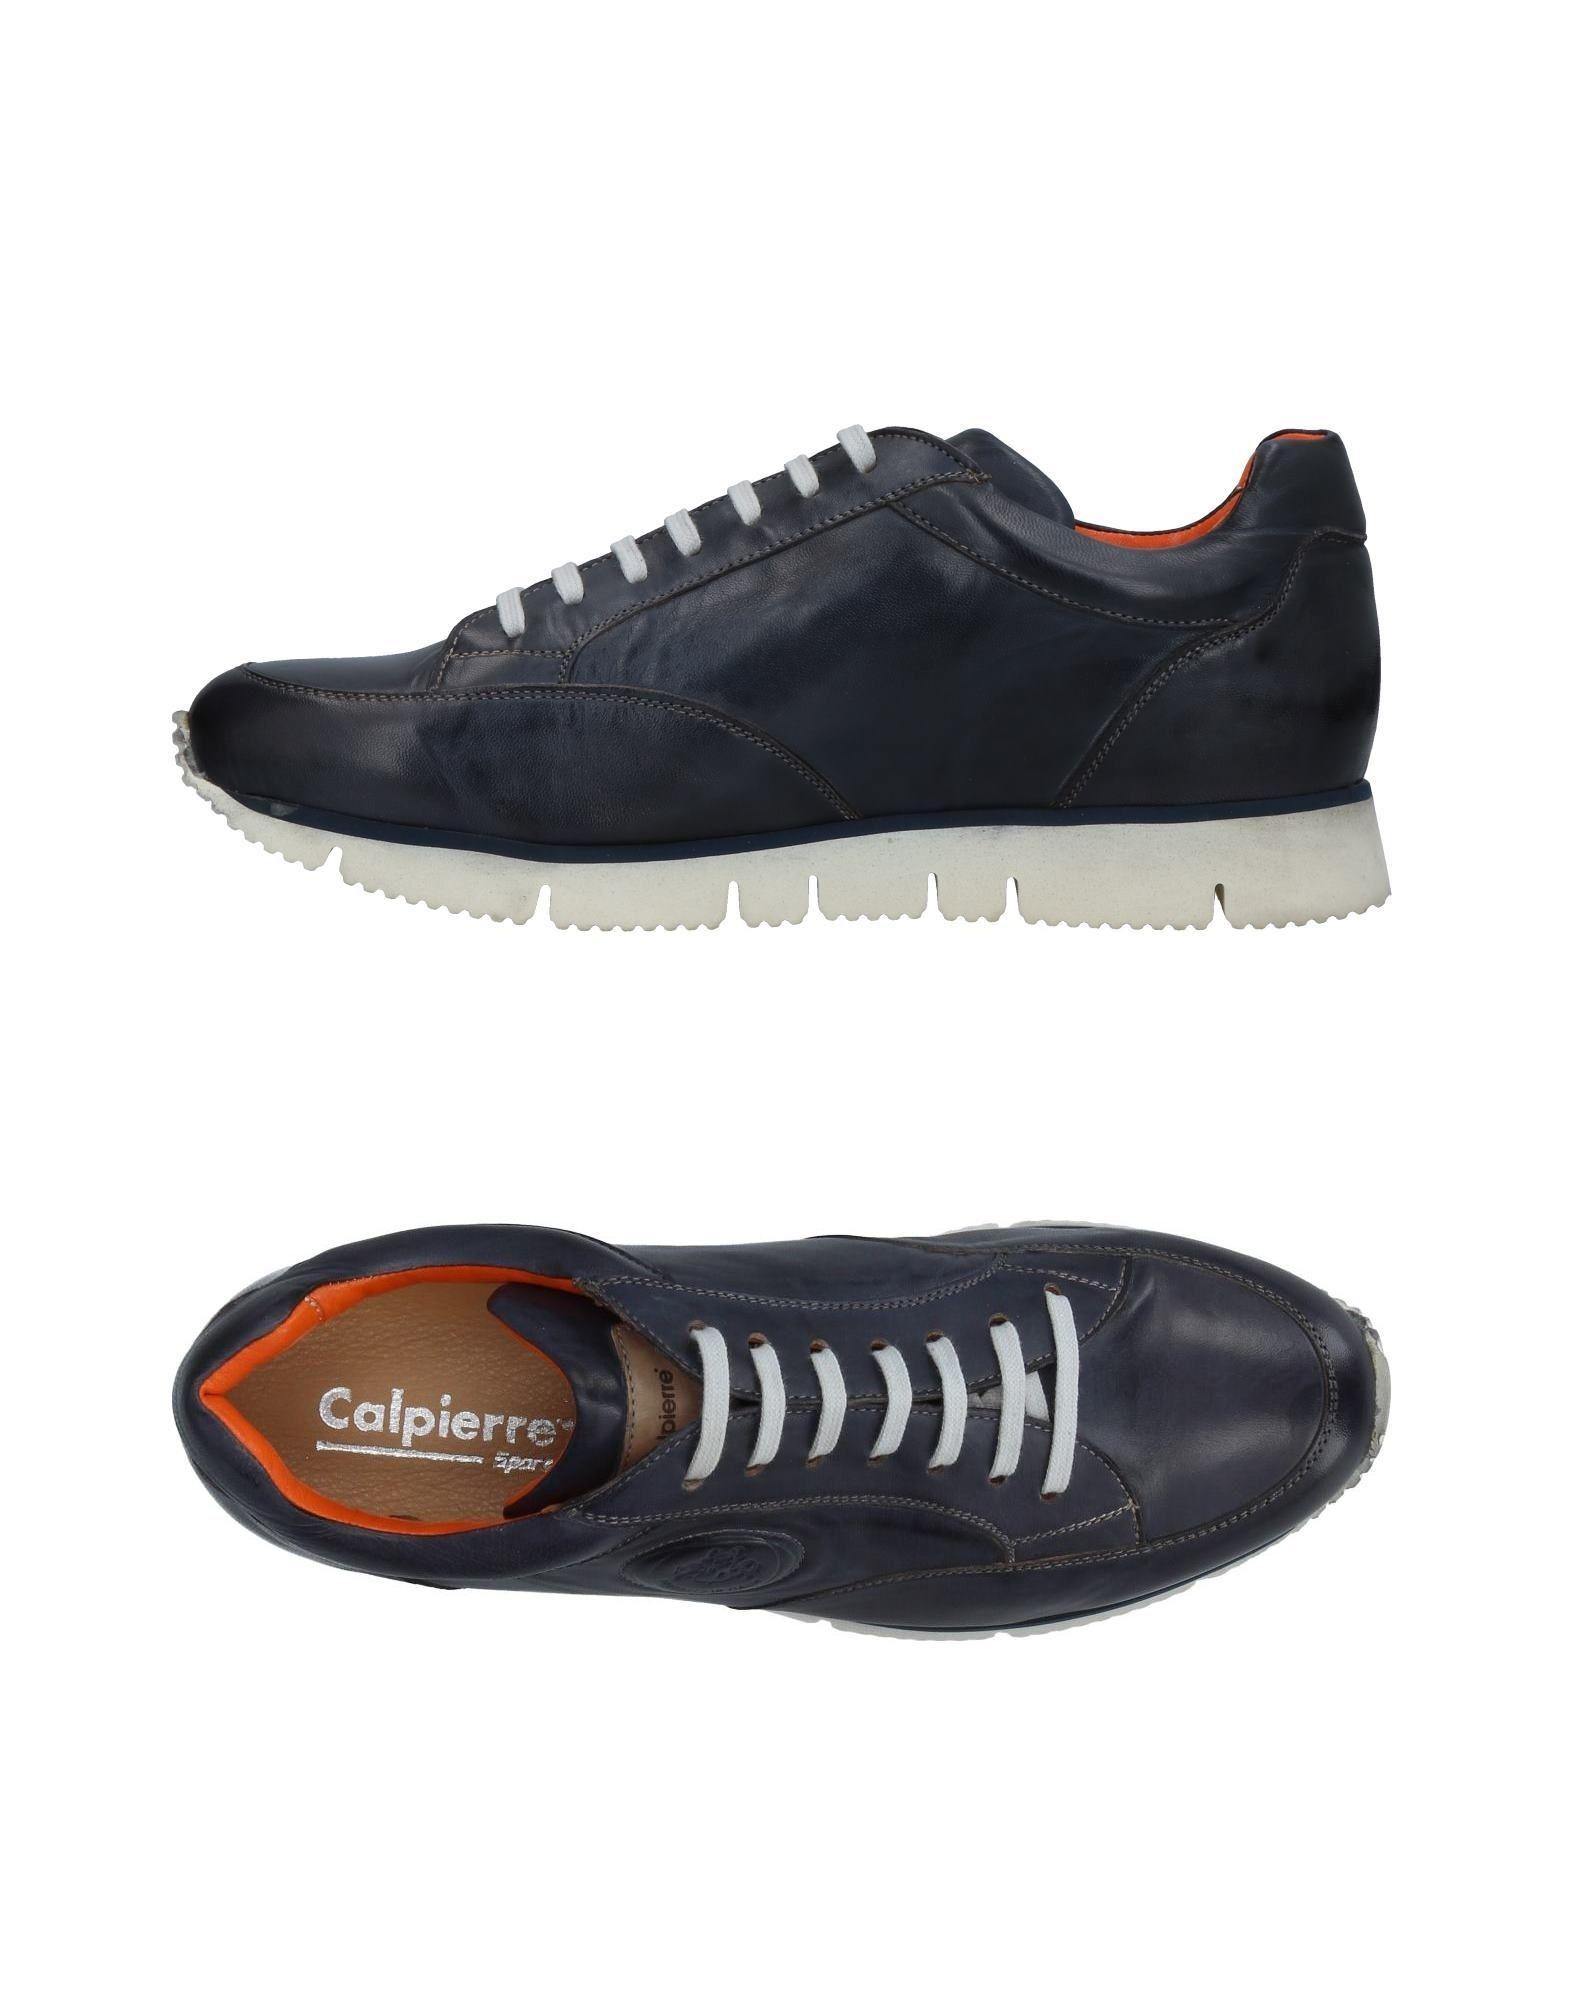 Sneakers Calpierre Uomo - Acquista online su